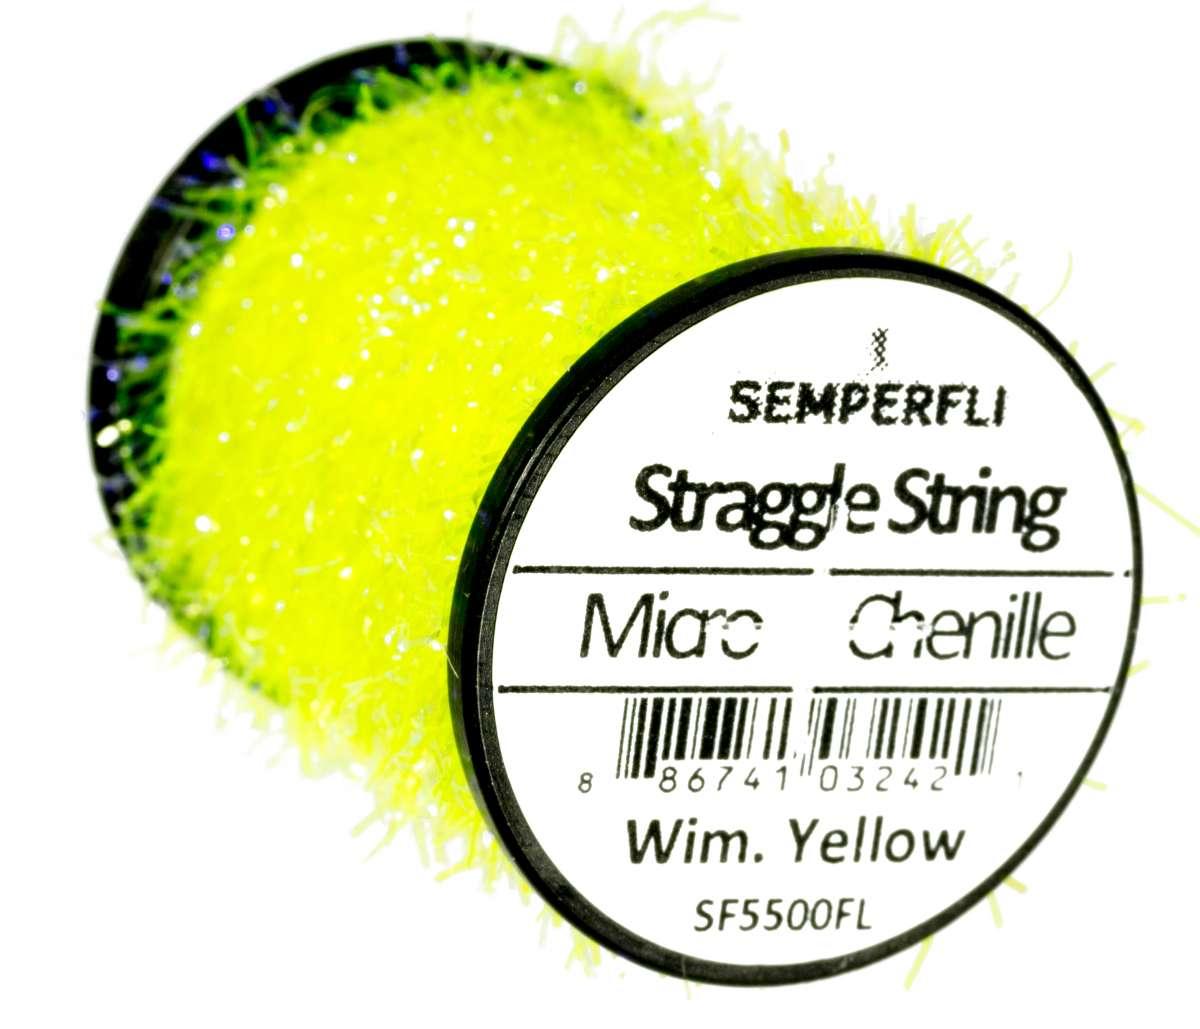 Straggle String ss-sf5500fl winbledon yellow